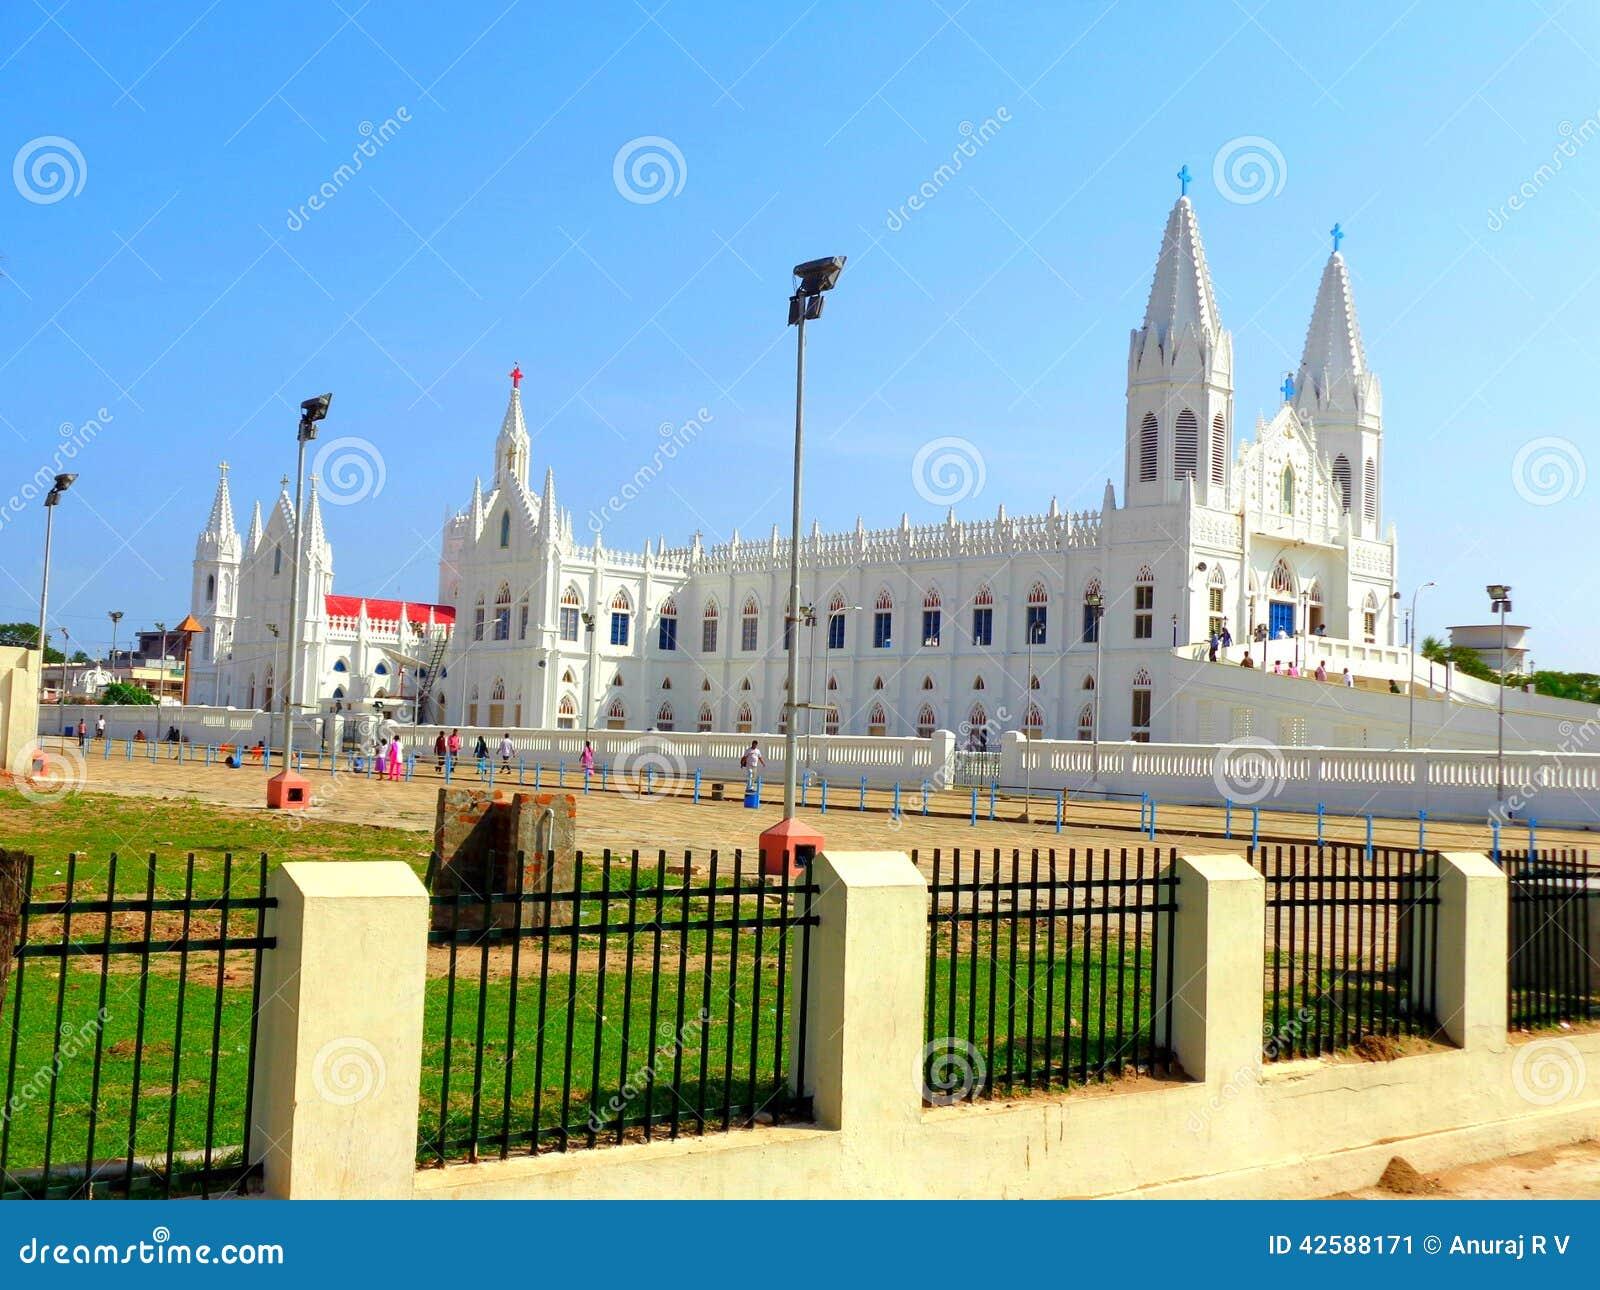 velankanni matha church located in tamil nadu stock image image of